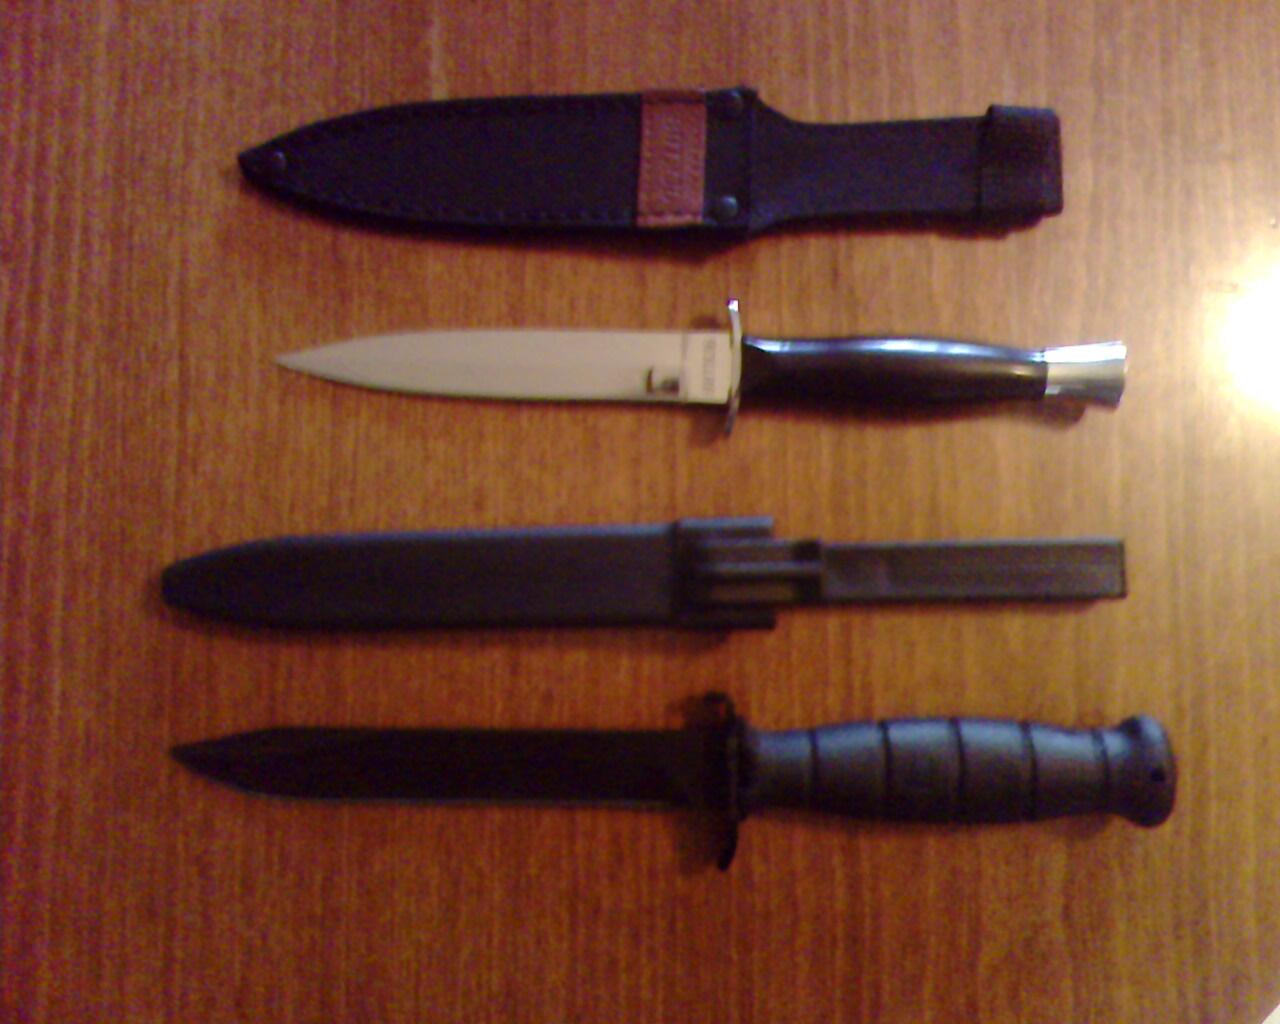 http://knifethrowingmaster.narod.ru/knives.jpg